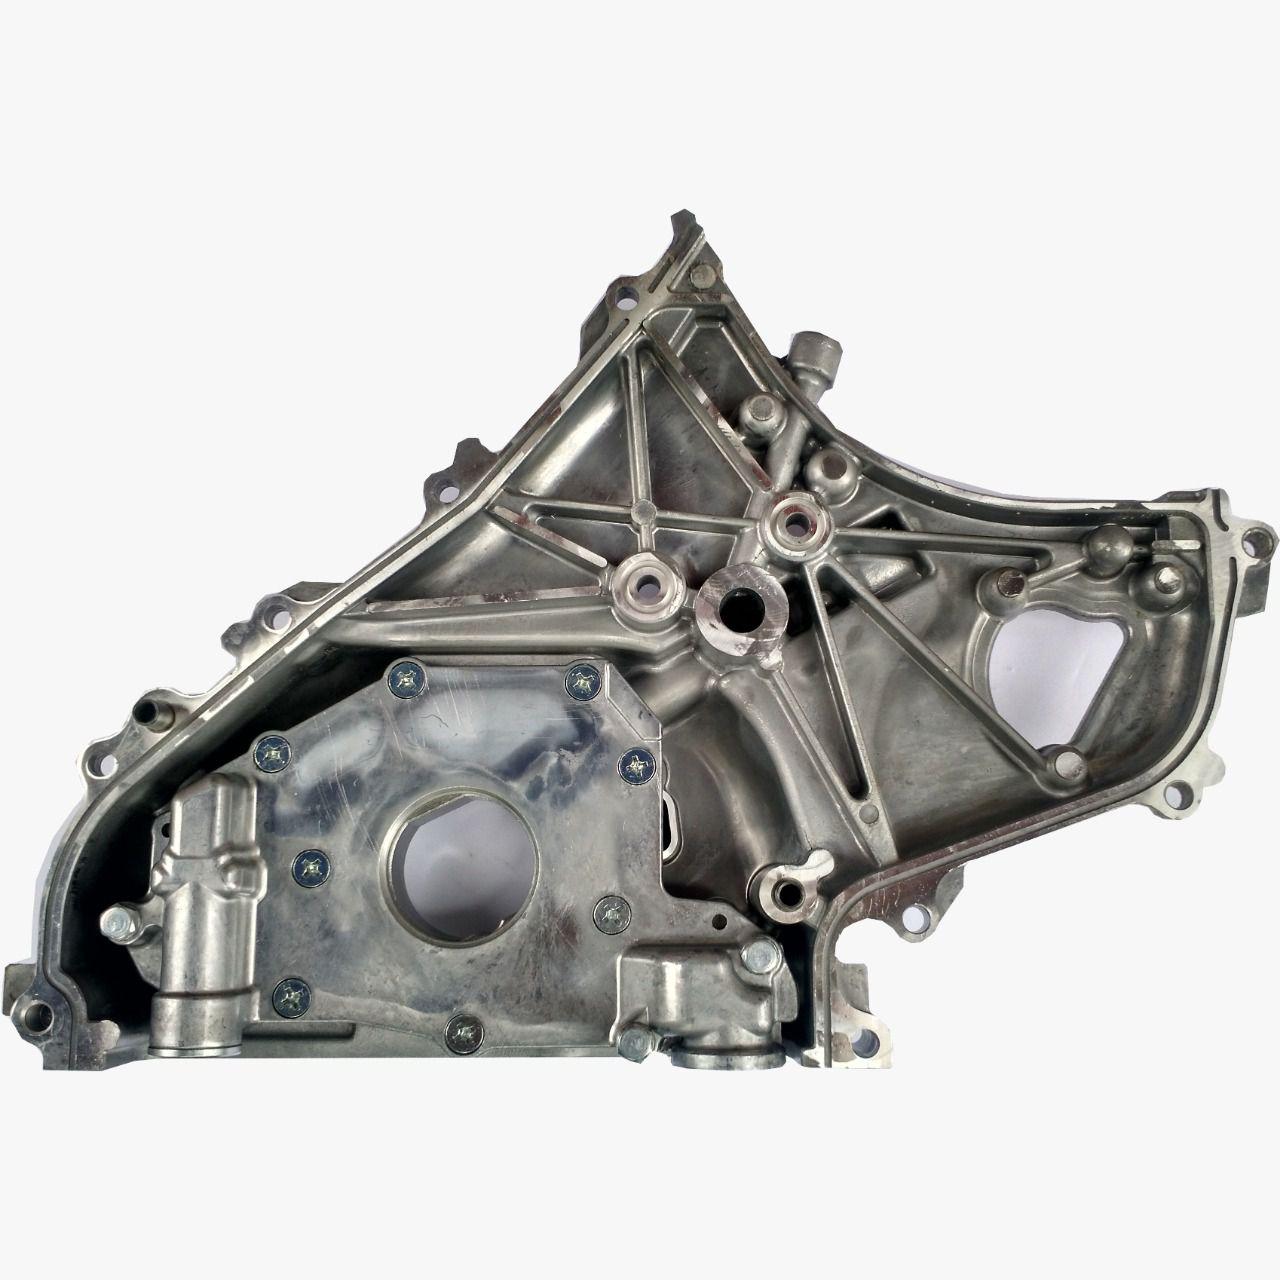 Bomba de Óleo Nissan  Frontier 2.5 16v TD LE / XE / SE / SEL Ano 2008 a 2011 Euro 3 Motor YD25DDTI